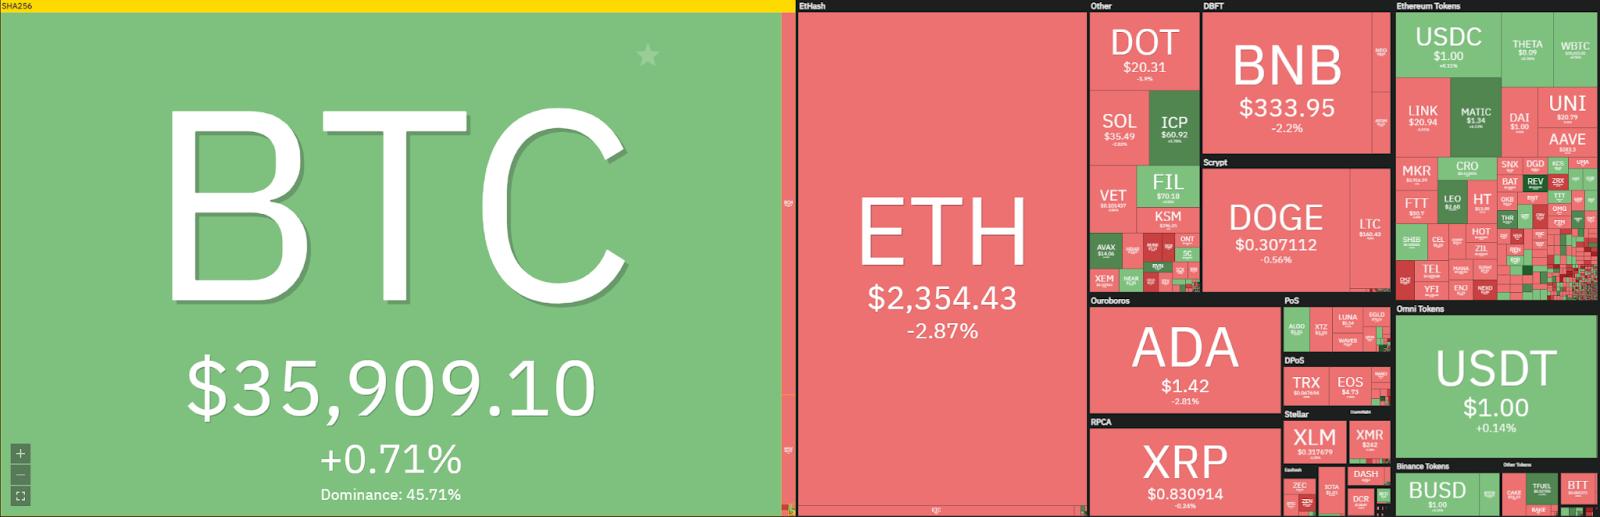 Bitcoin price analysis: Bitcoin continues trading sideways around $35,000, push above $40,000 next week? 1